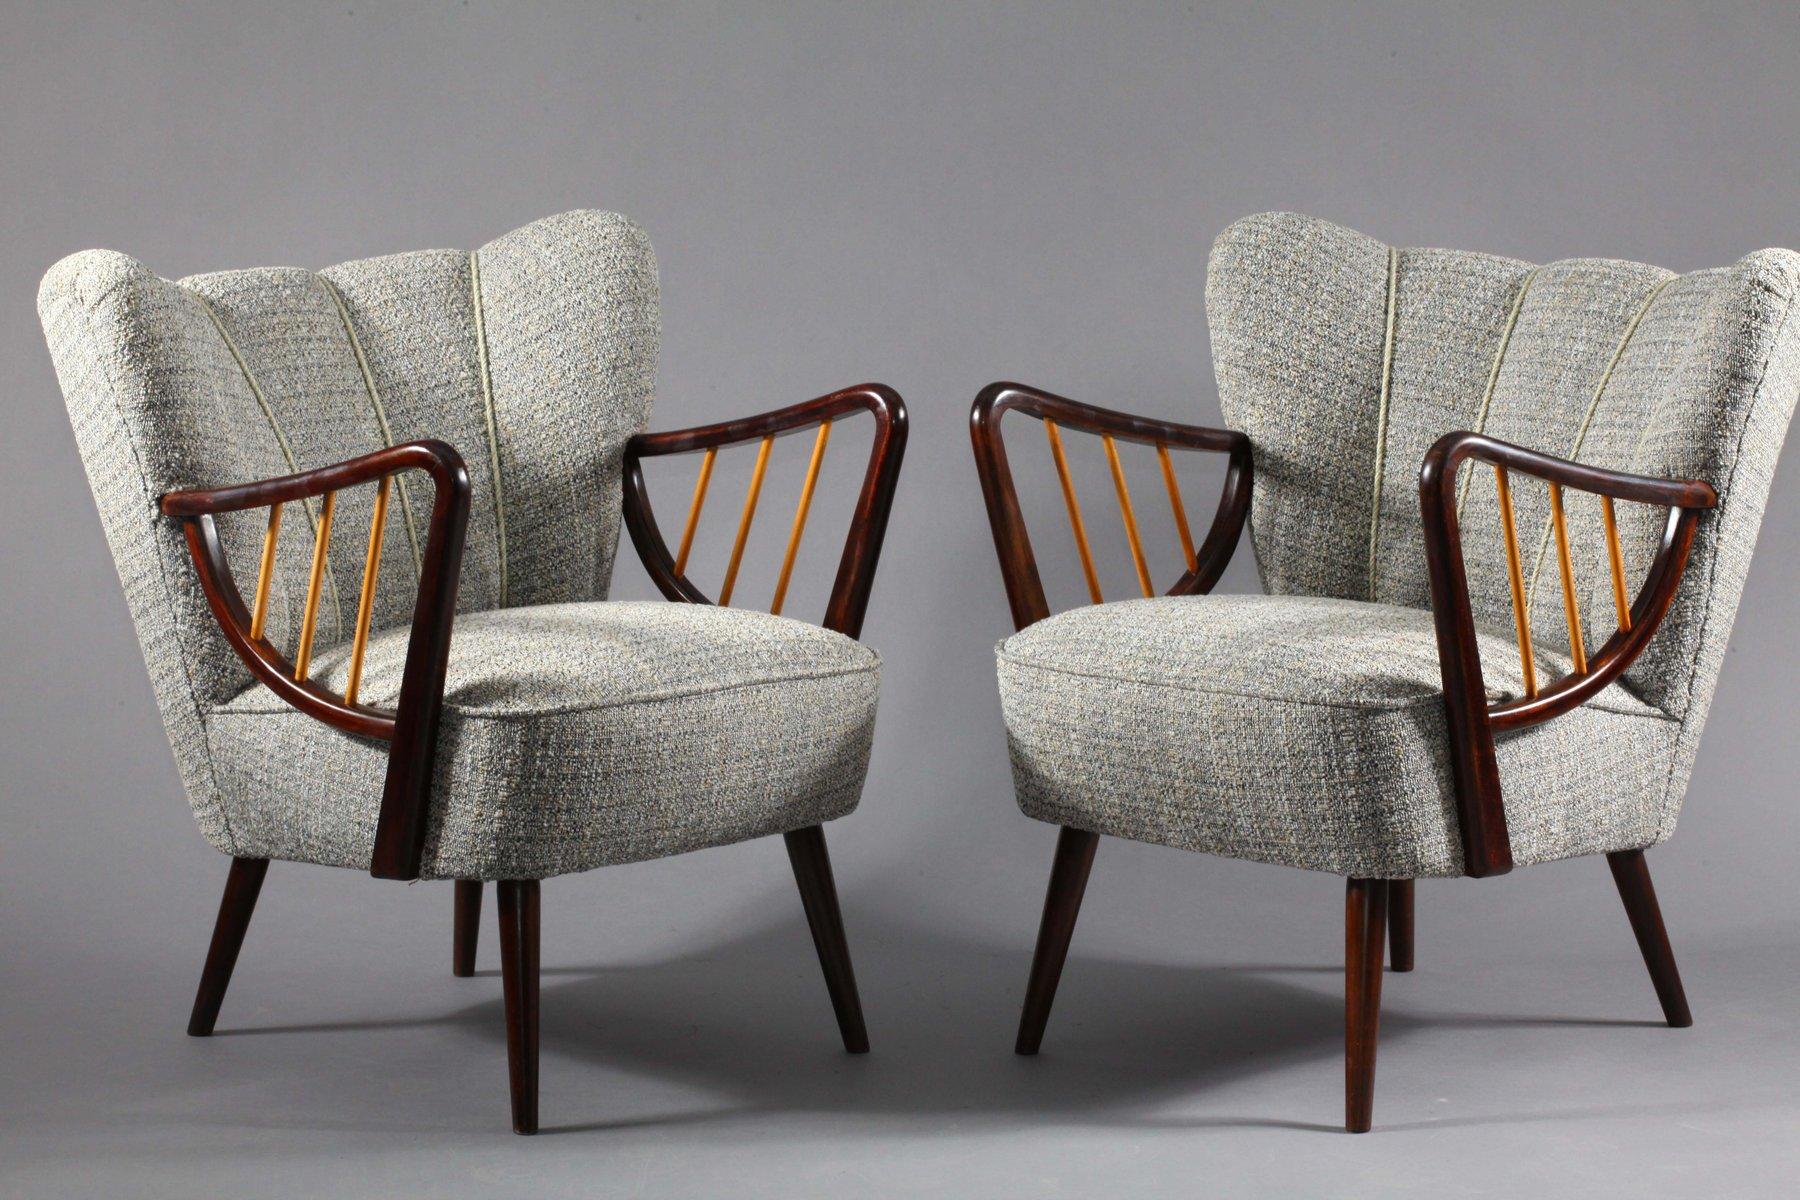 Vintage Sessel aus Buche, 2er Set